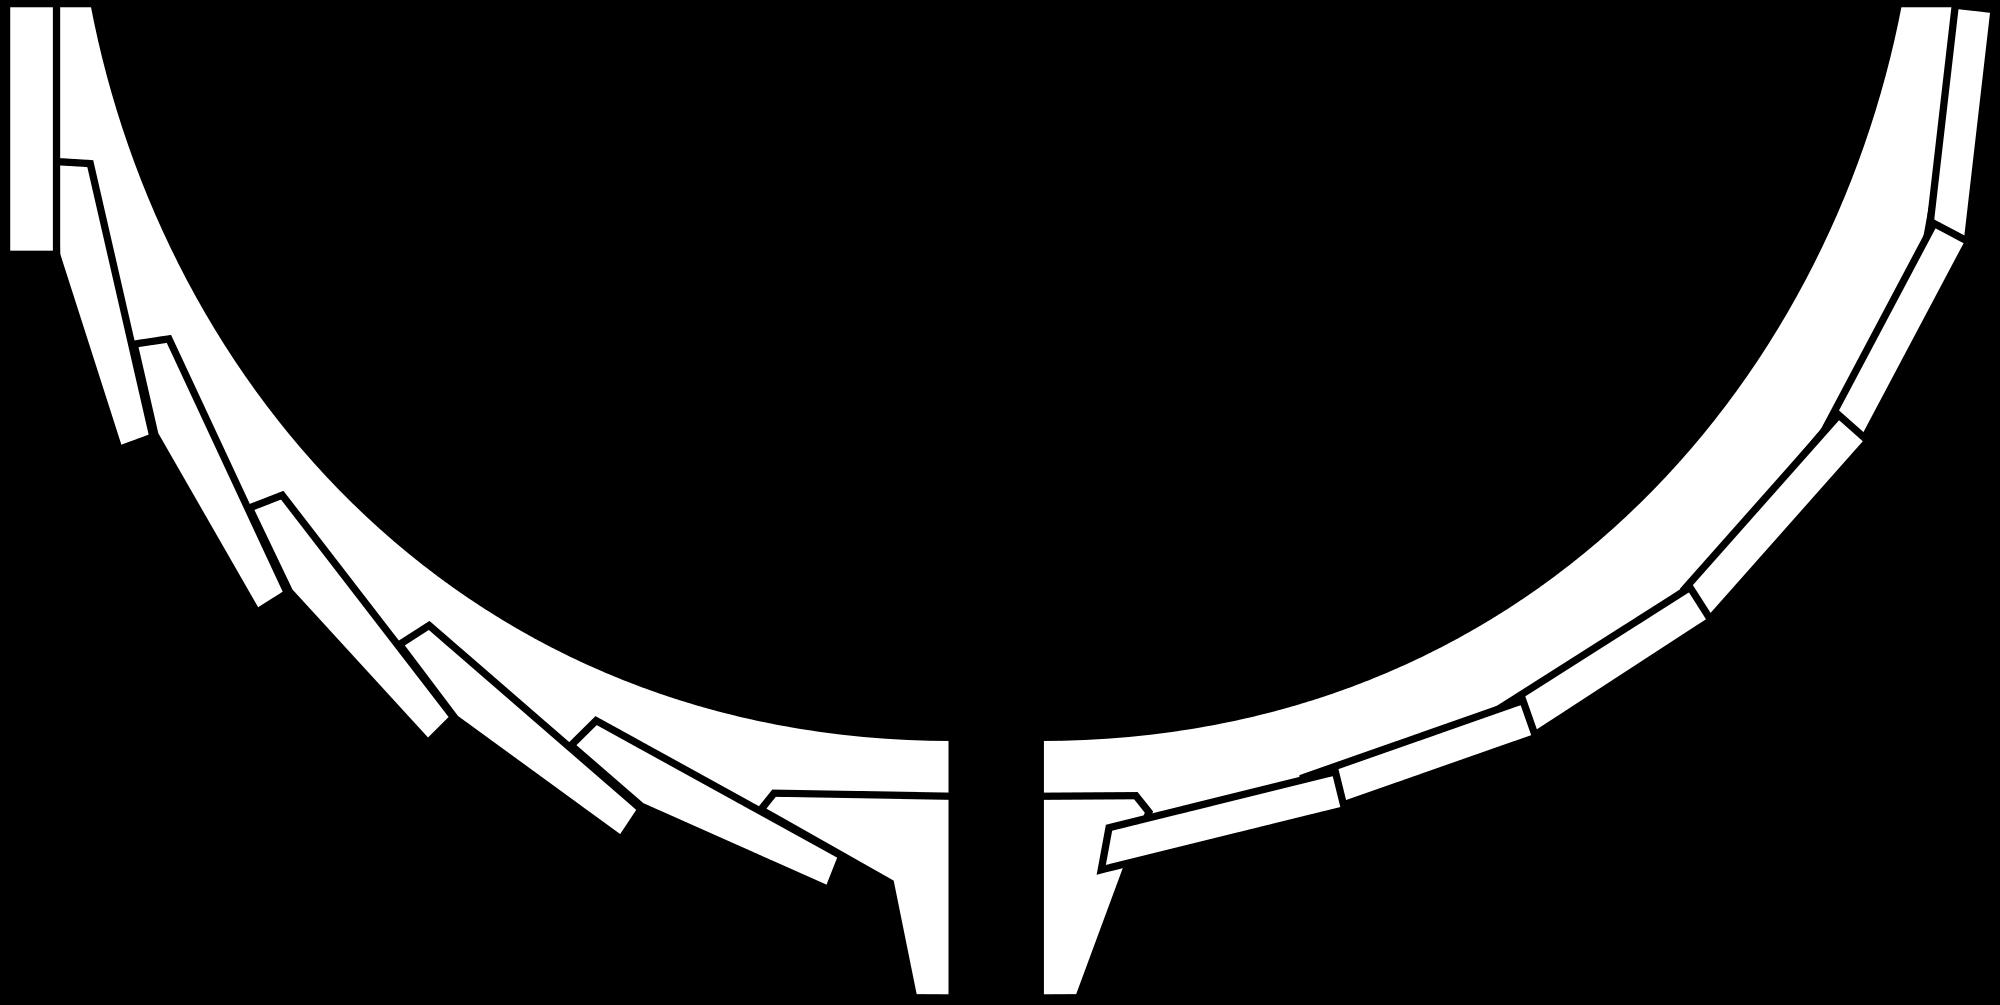 Labeled Diagram Caravel